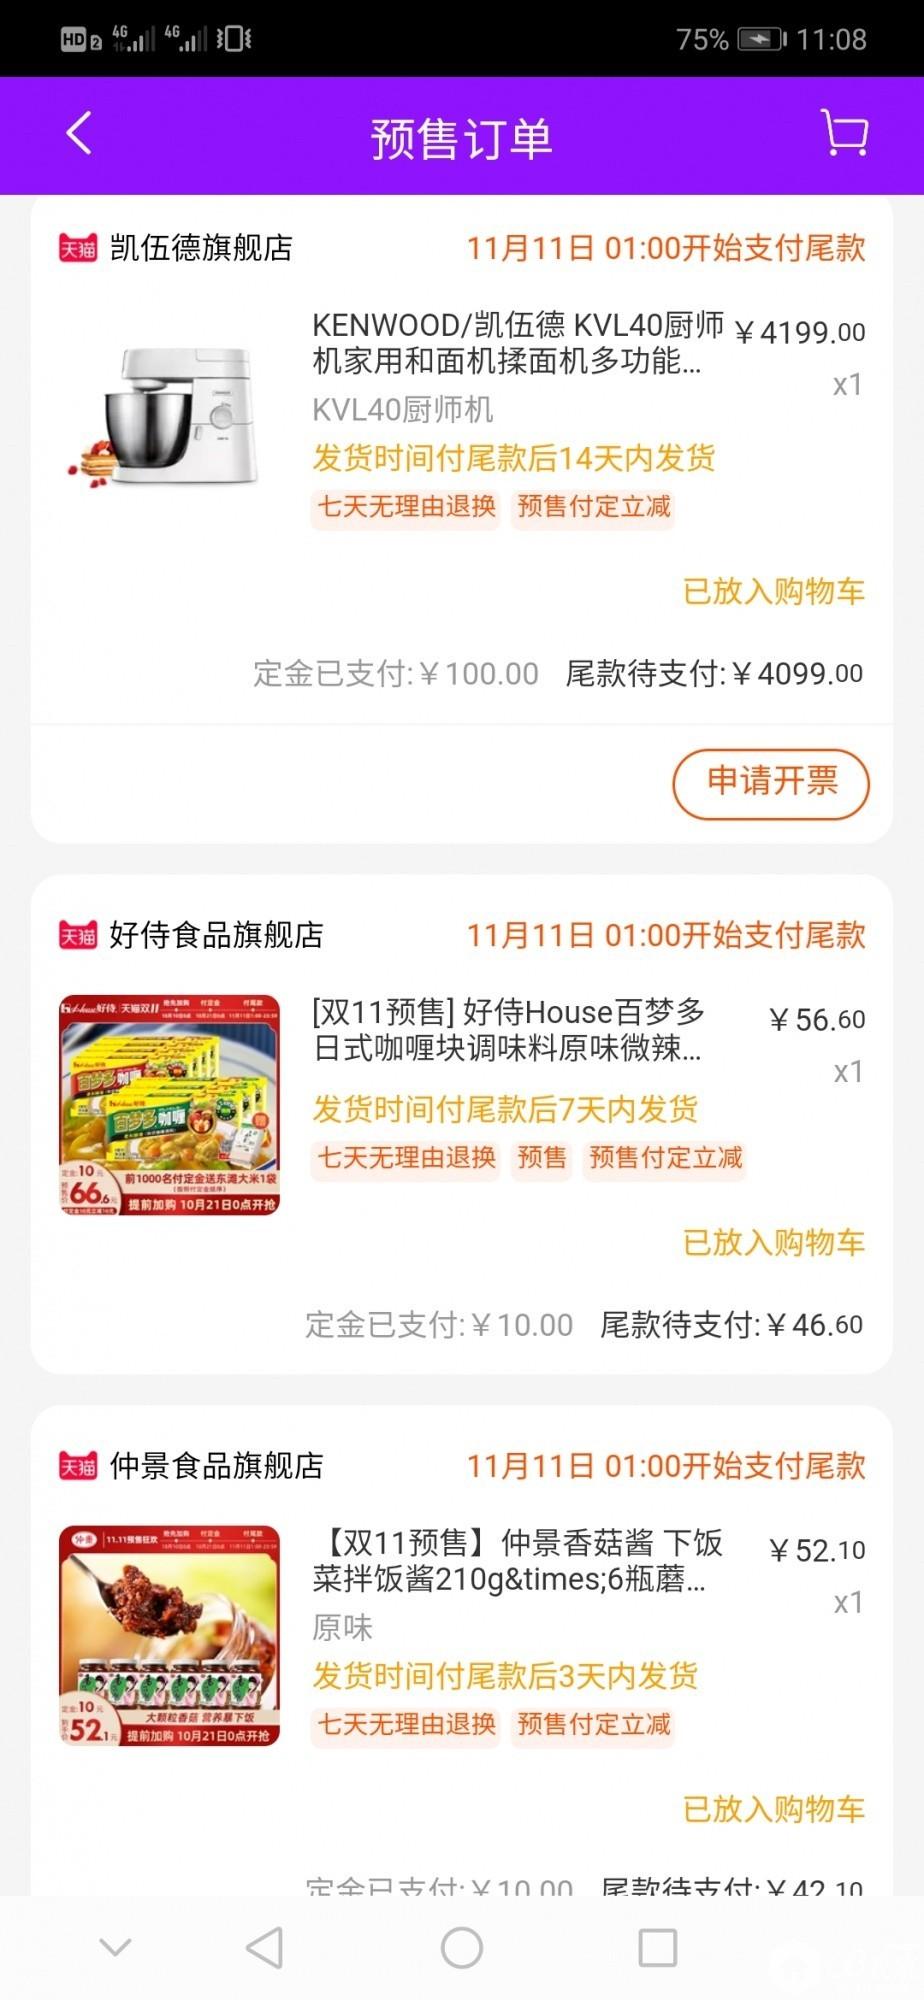 Screenshot_20191031_230811_com.taobao.taobao.jpg